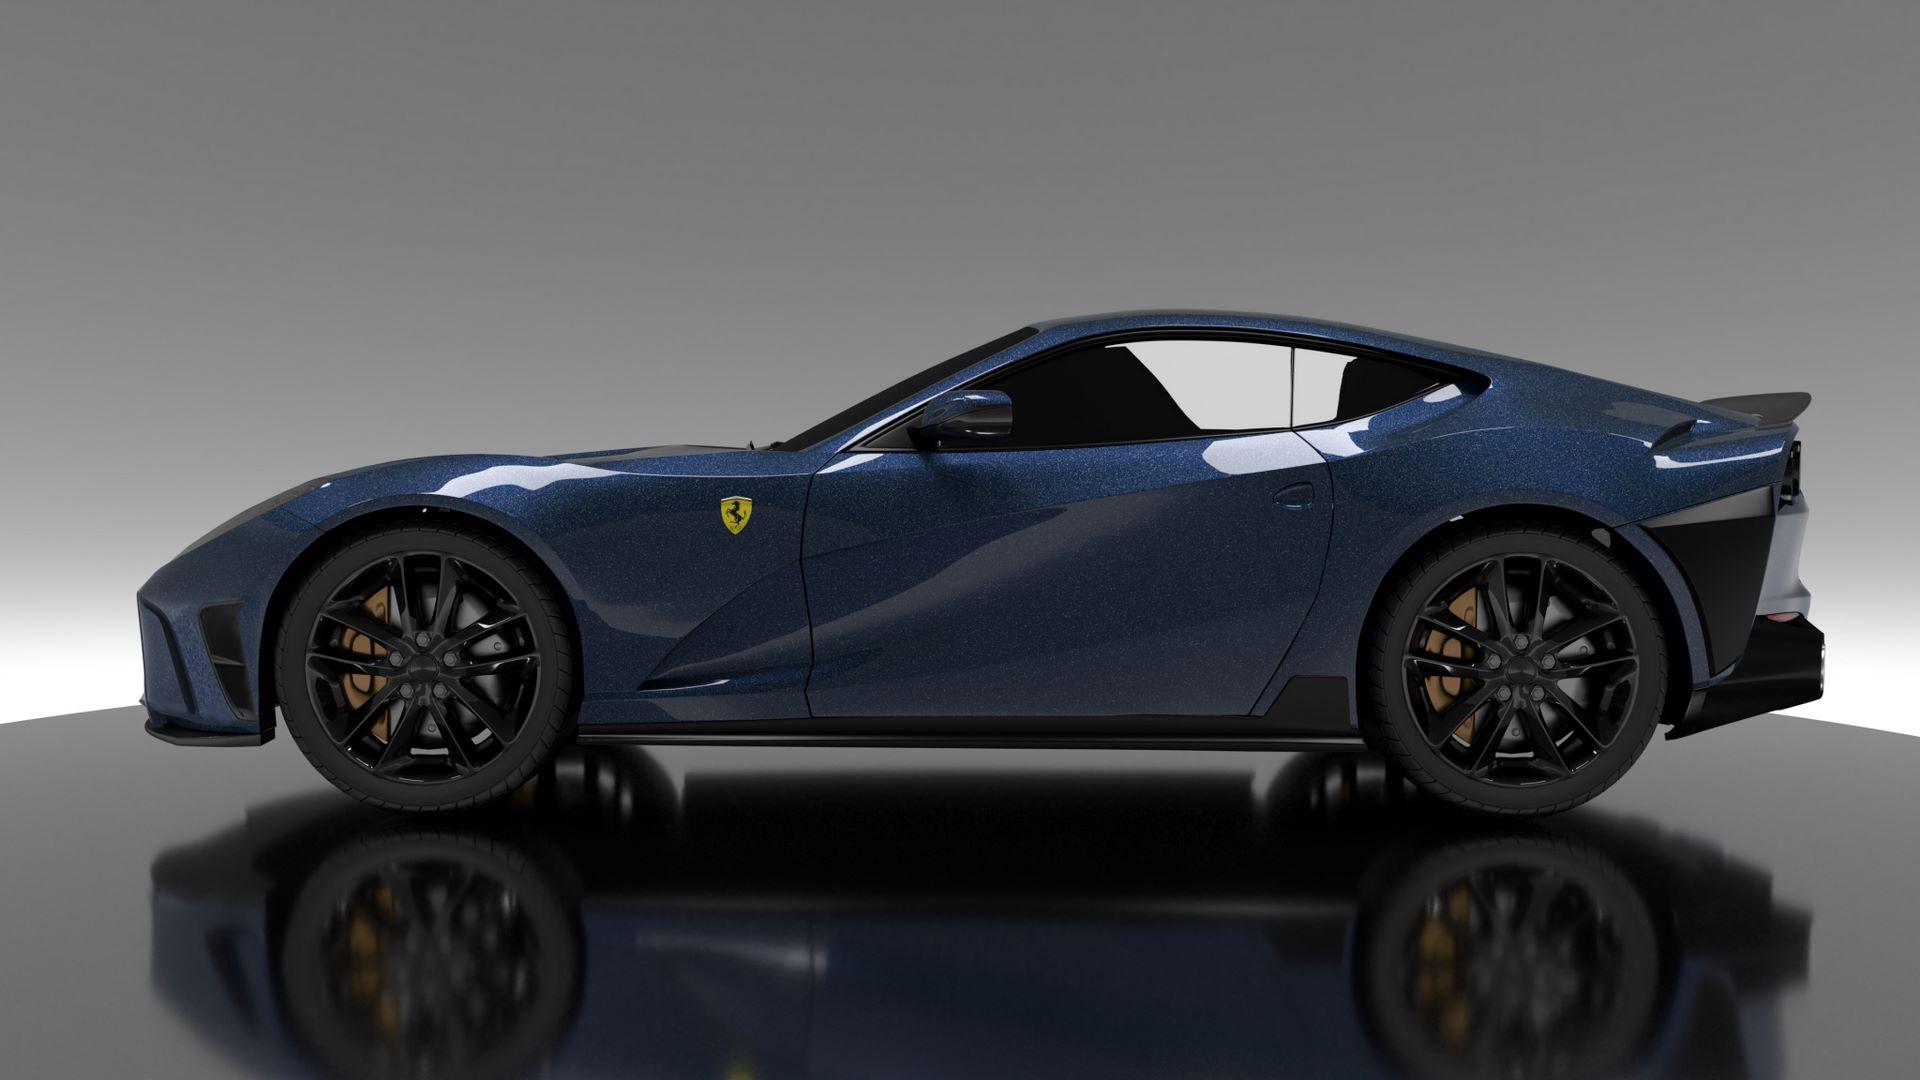 Ferrari-812-Superfast-Spia-by-DMC-2